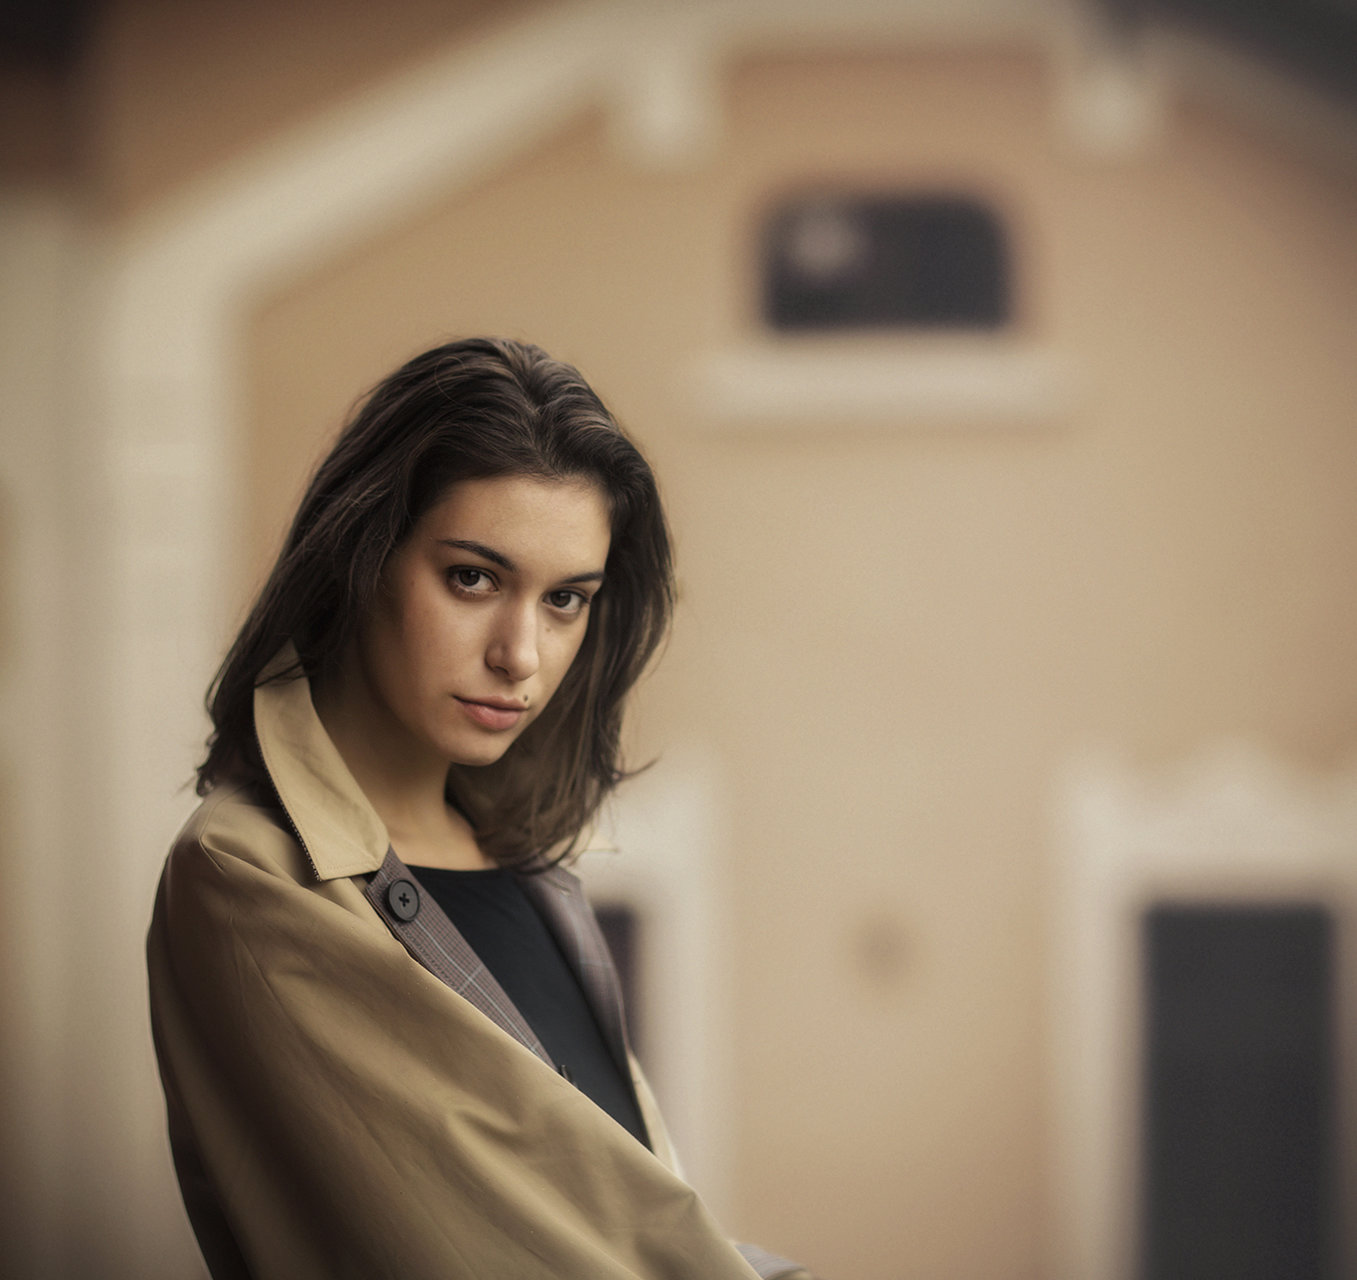 Photo in Portrait | Author Desislava Kuleshova - desiart78 | PHOTO FORUM